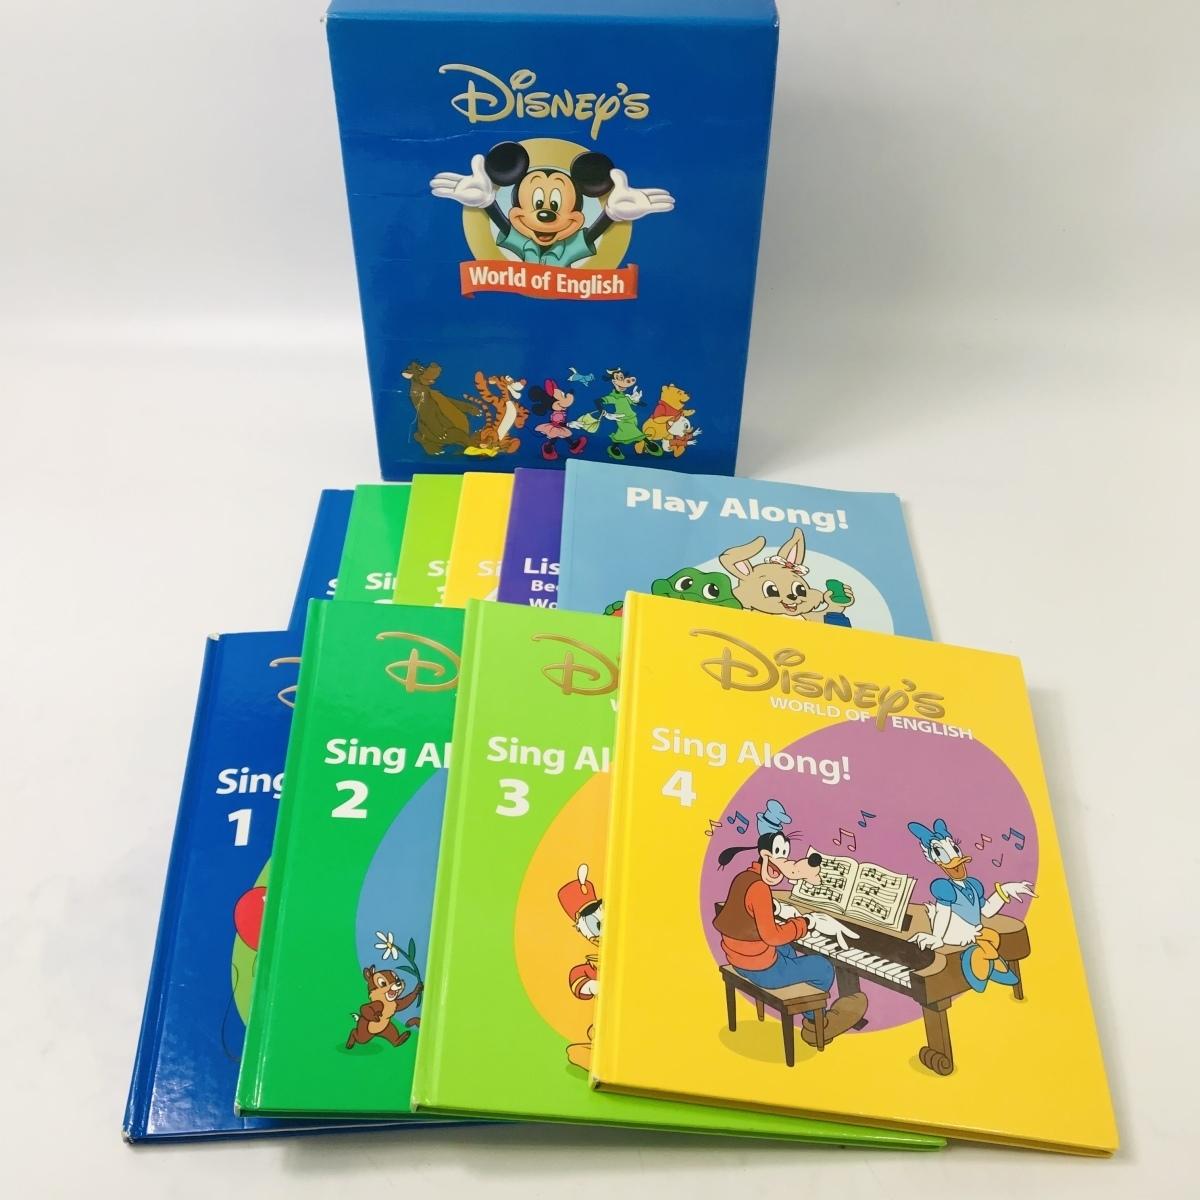 Disney World English DWE ワールド イングリッシュ DVD CD PLAYMATE カード 等 セット_画像5